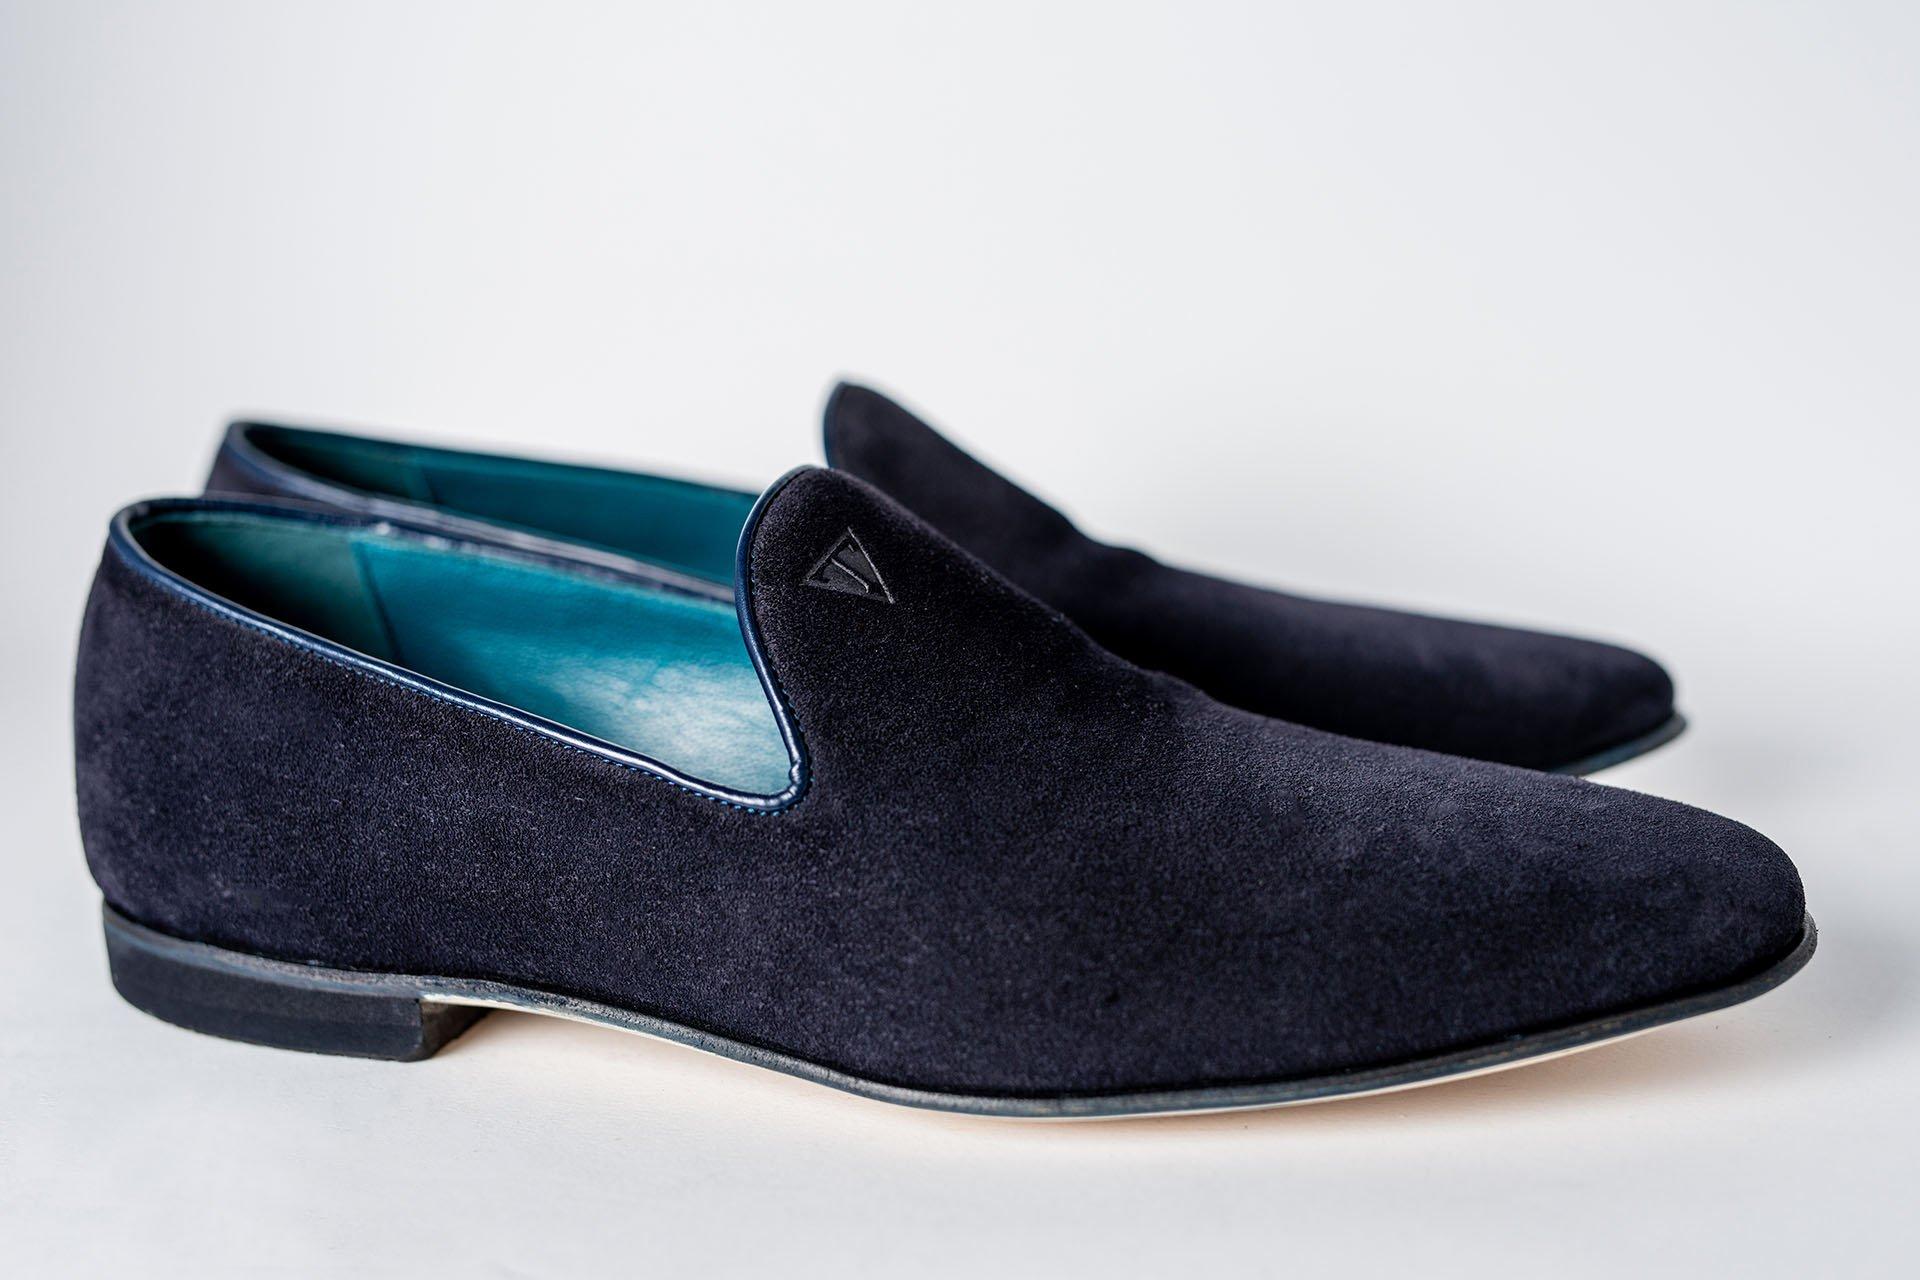 Pantofola-camoscio-blu-1